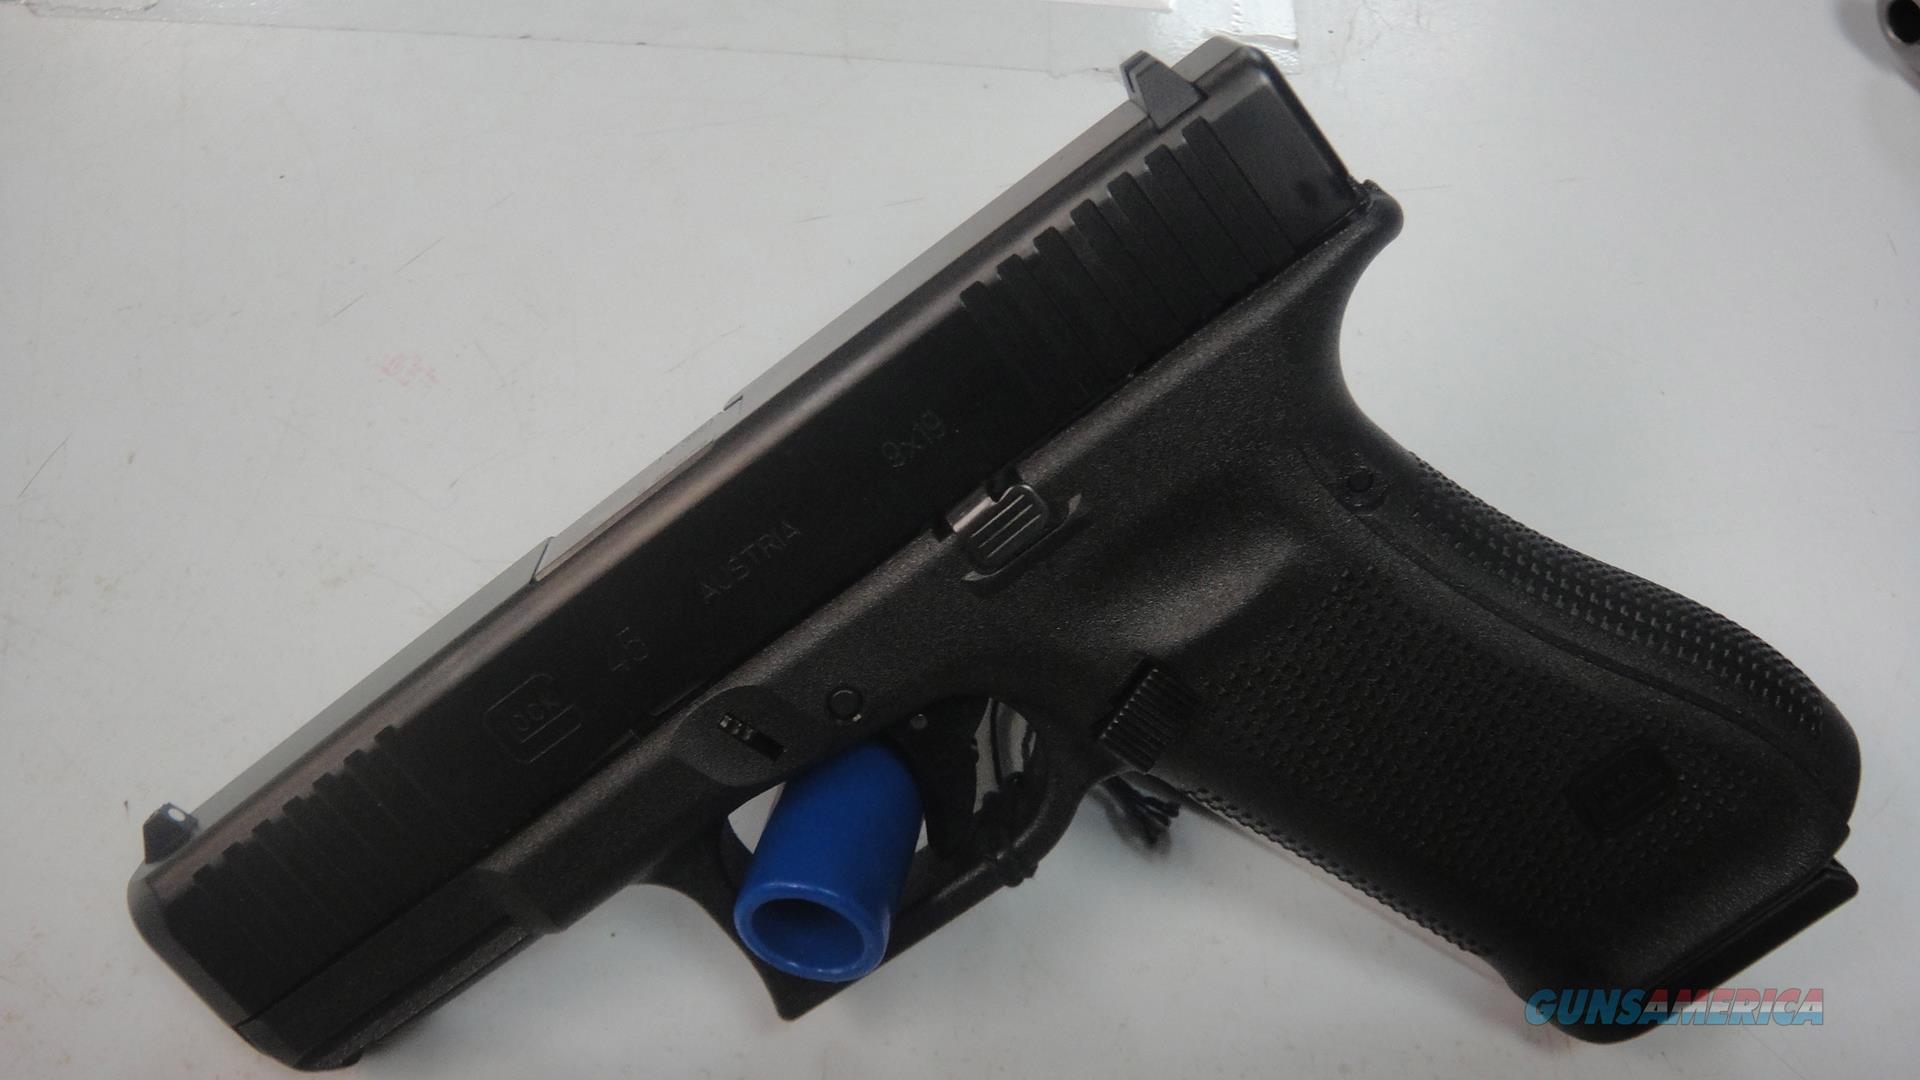 NEW GLOCK 45  Guns > Pistols > Glock Pistols > 19